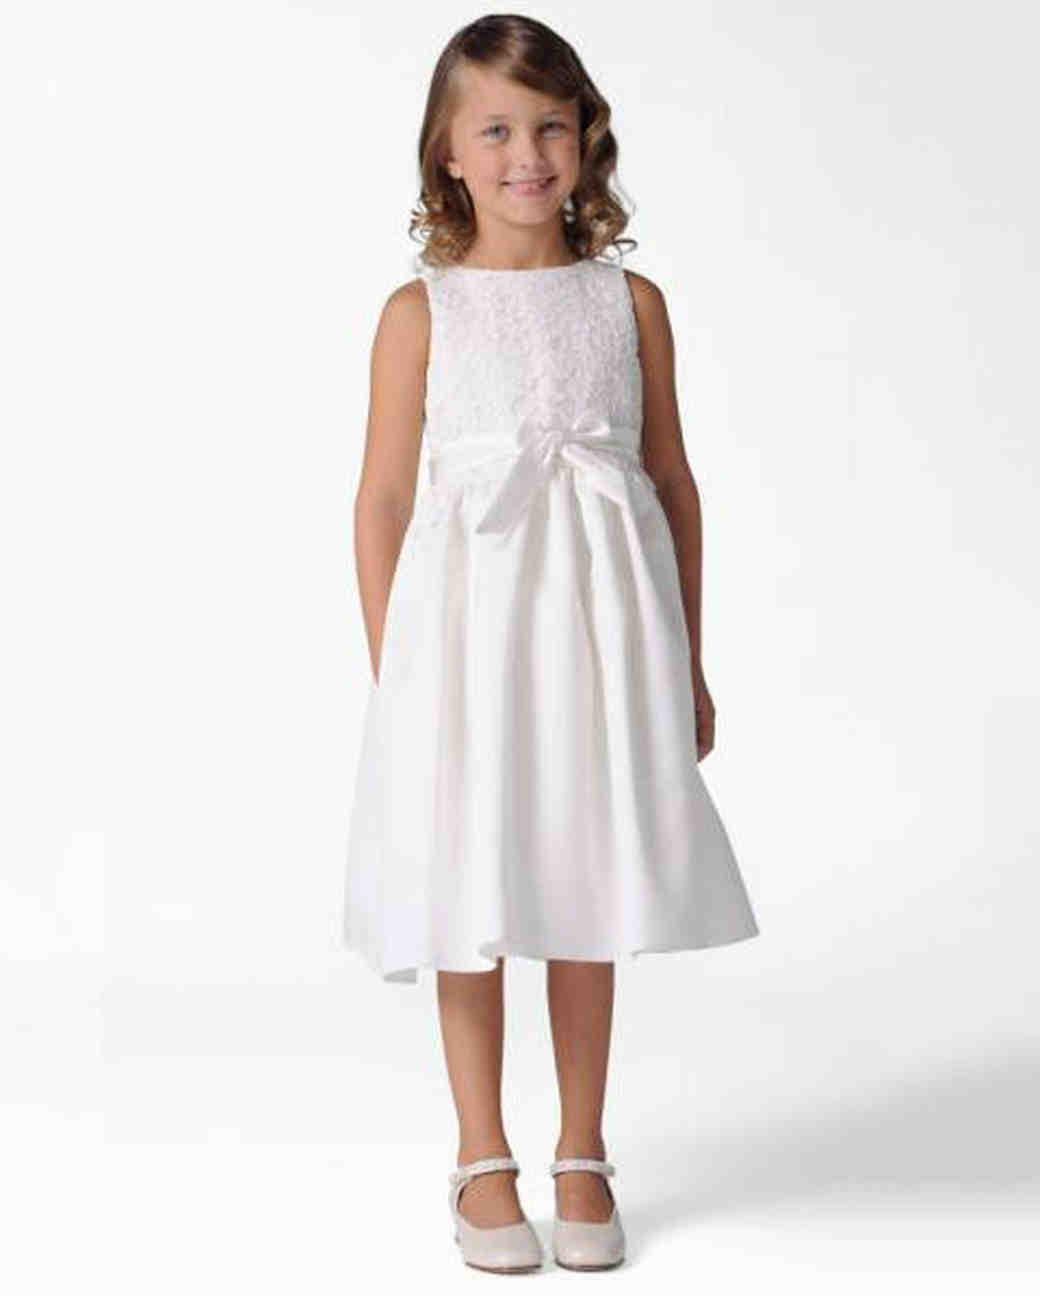 25 Of The Sweetest Lace Flower Girl Dresses Martha Stewart Weddings